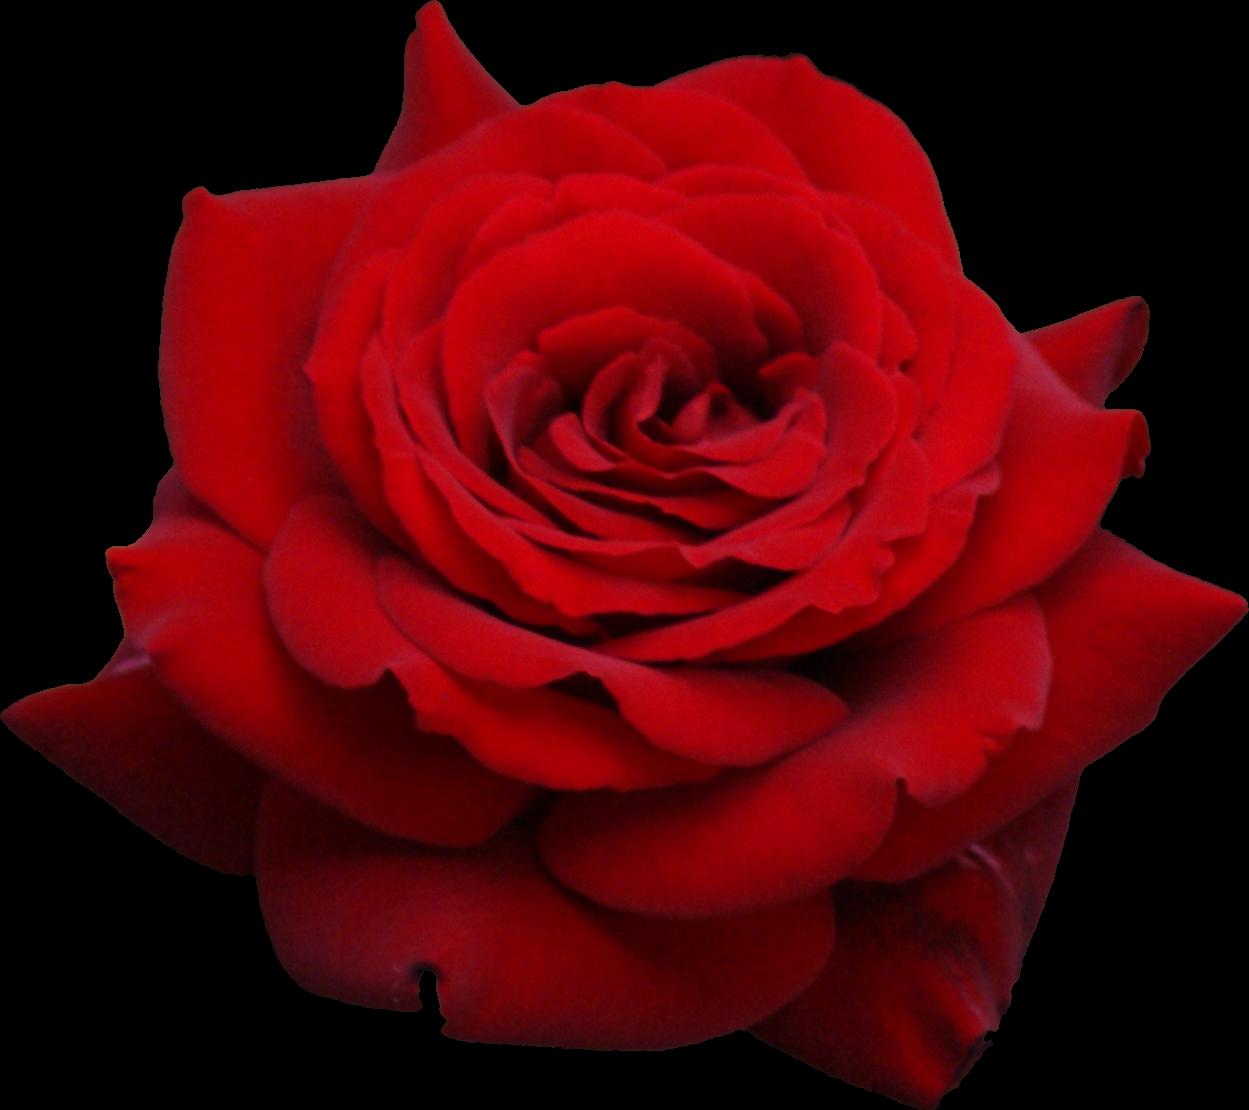 Hd transparent images pluspng. Rose flower png